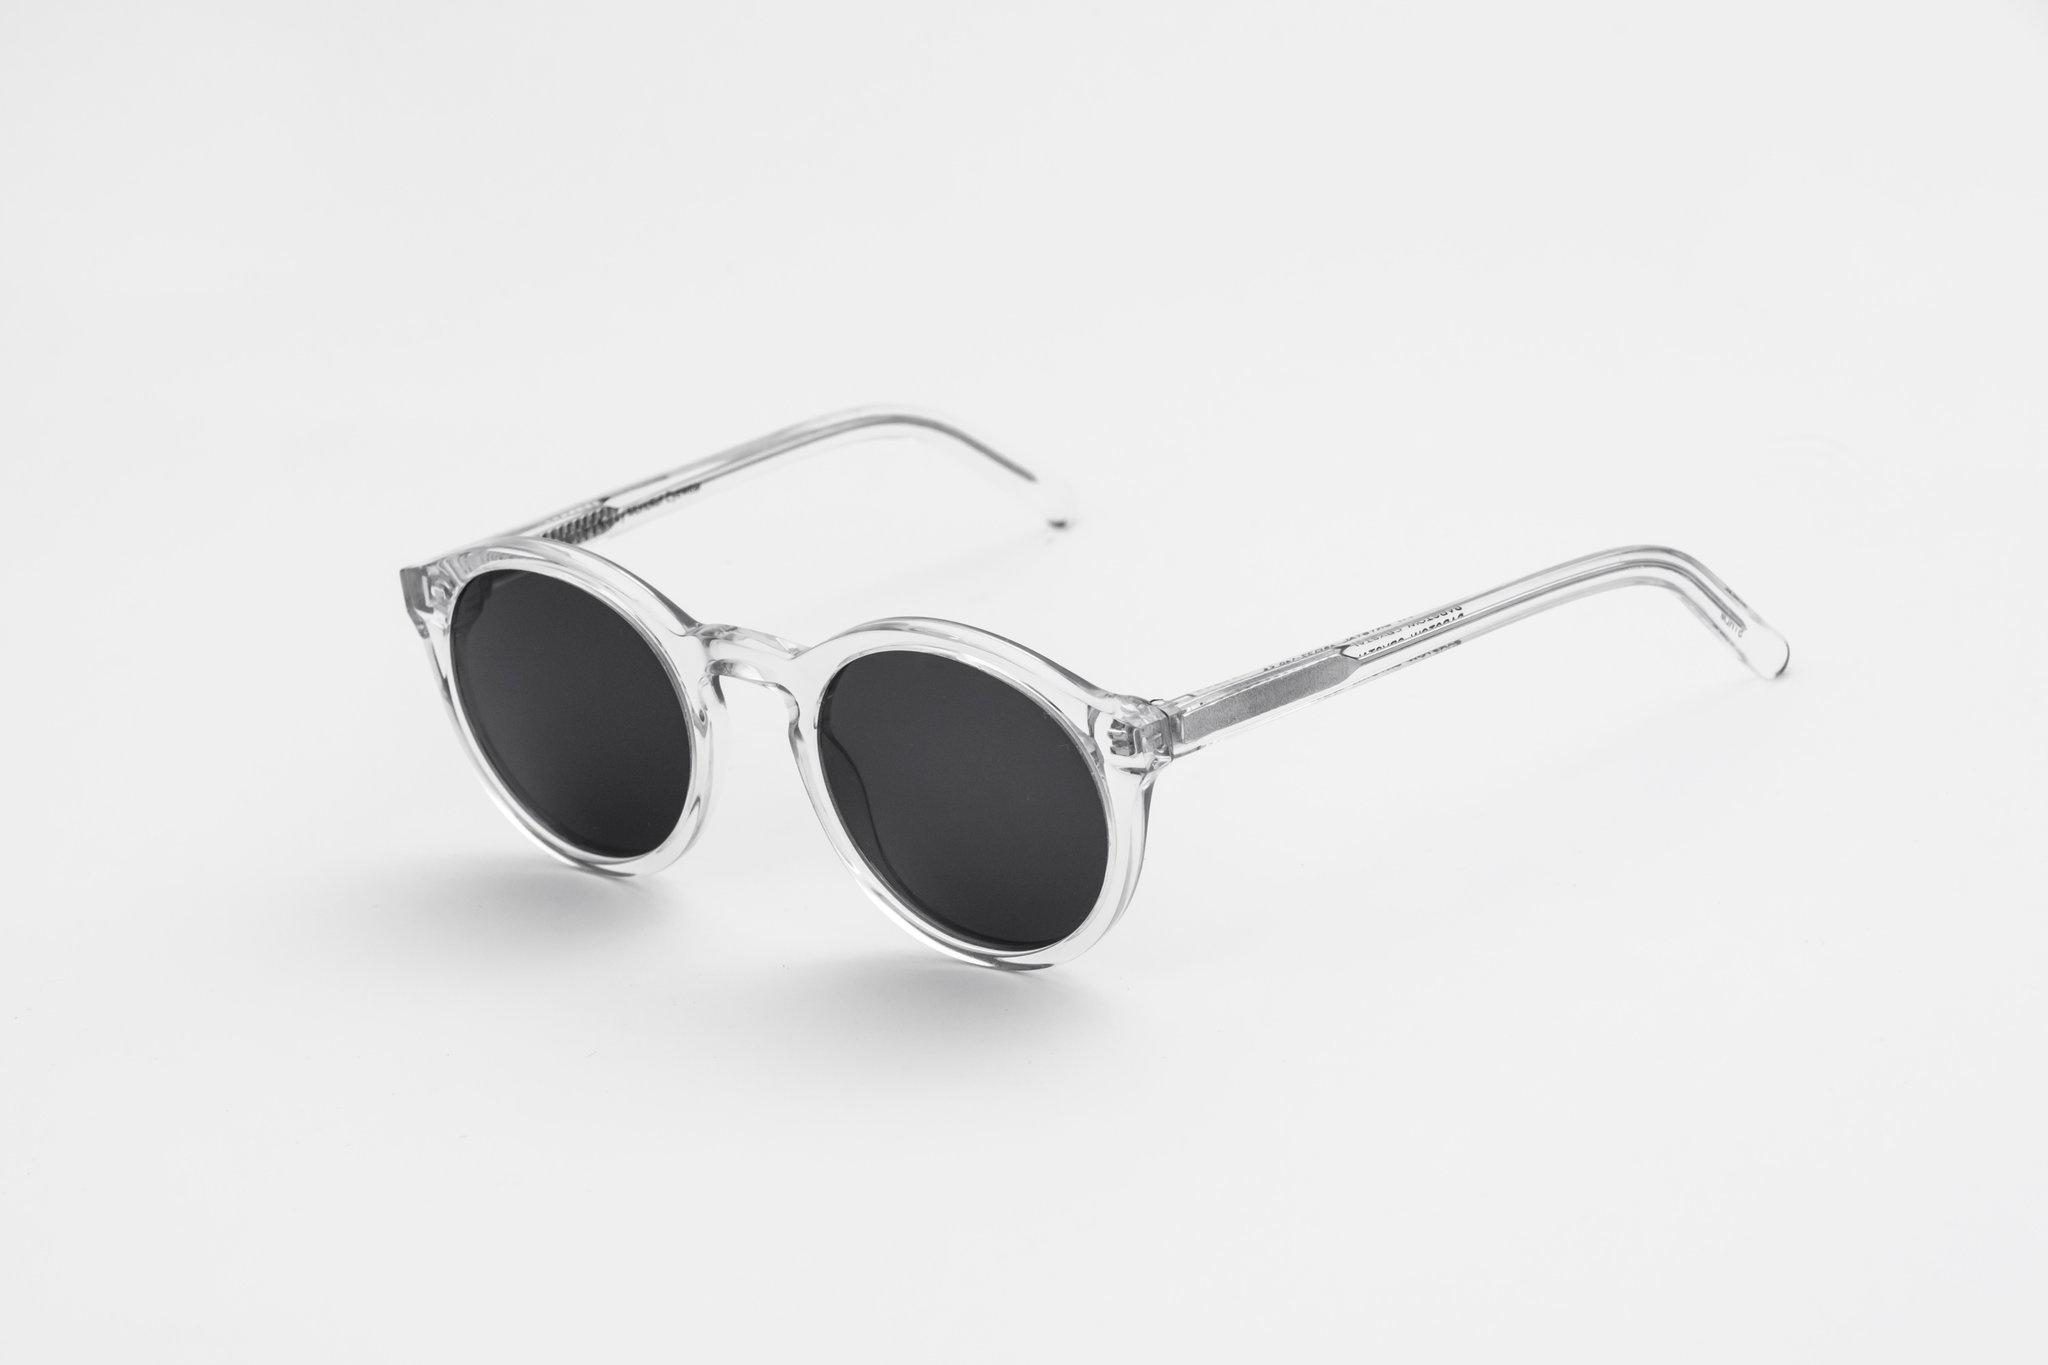 Barstow Crystal Clear Sunglasses-2